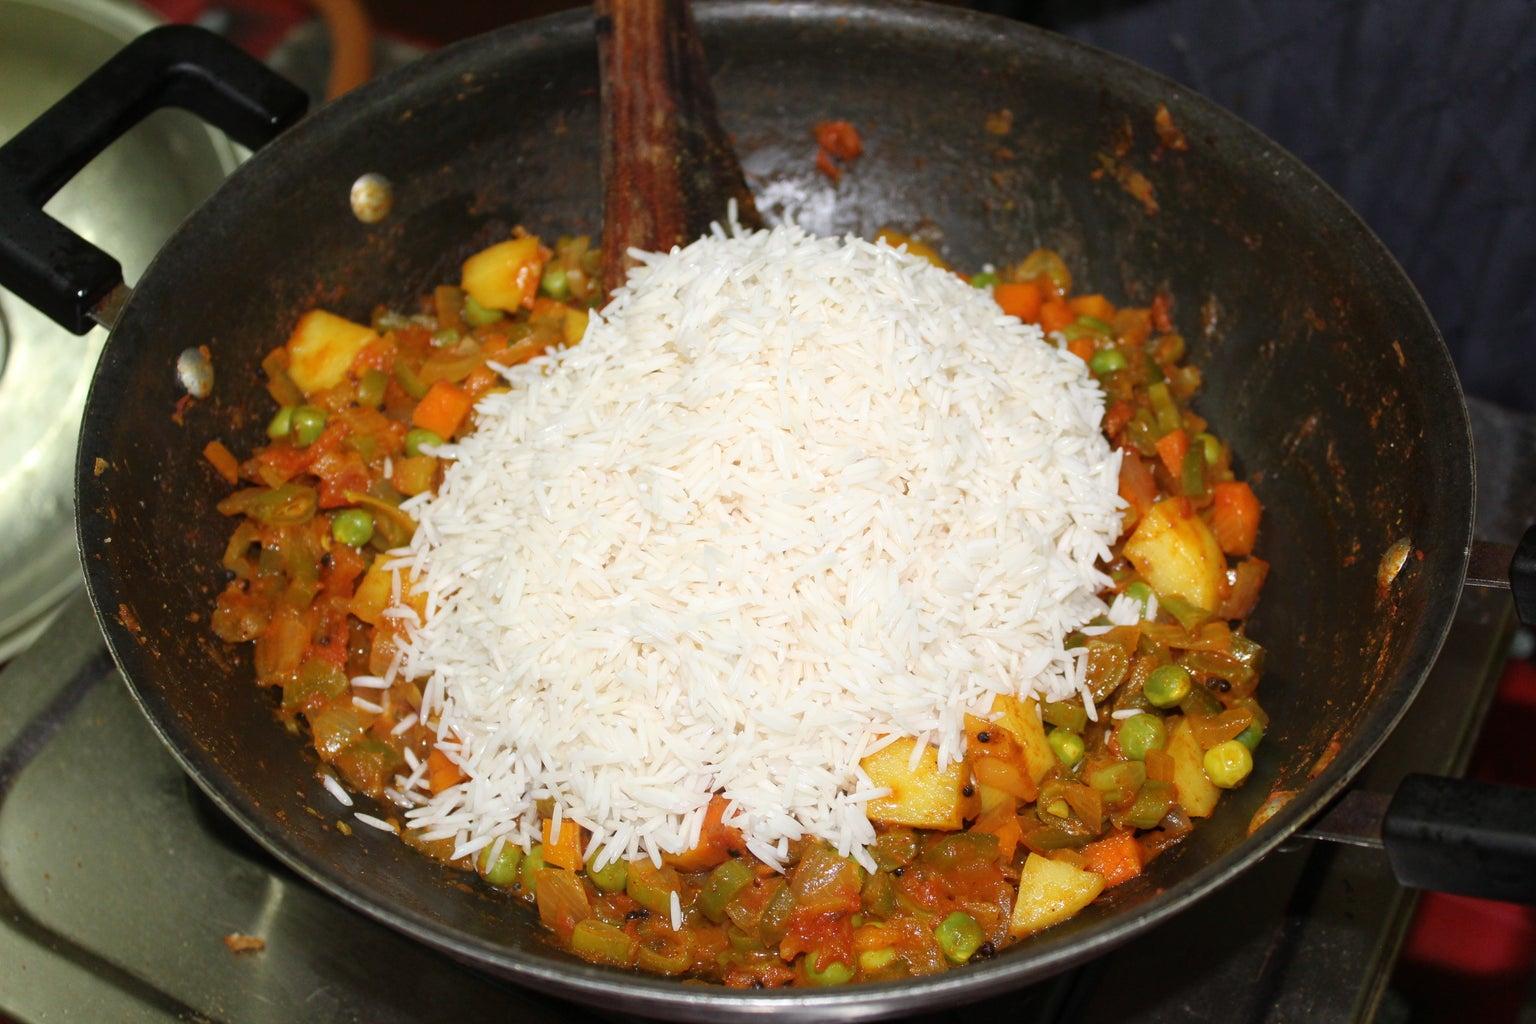 Add the Rice